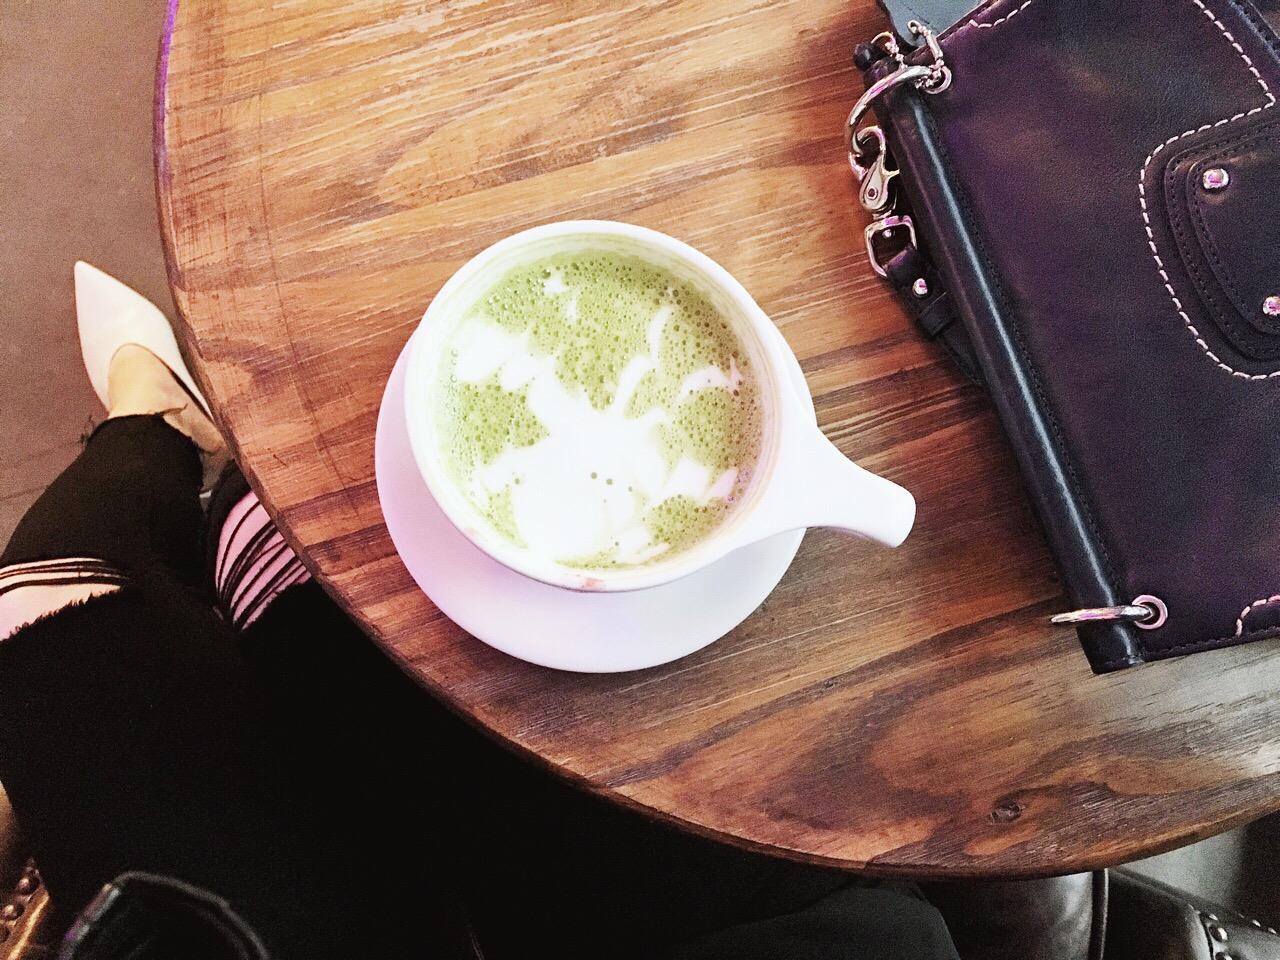 Top 4 Grammable Cafés in Queens, NY